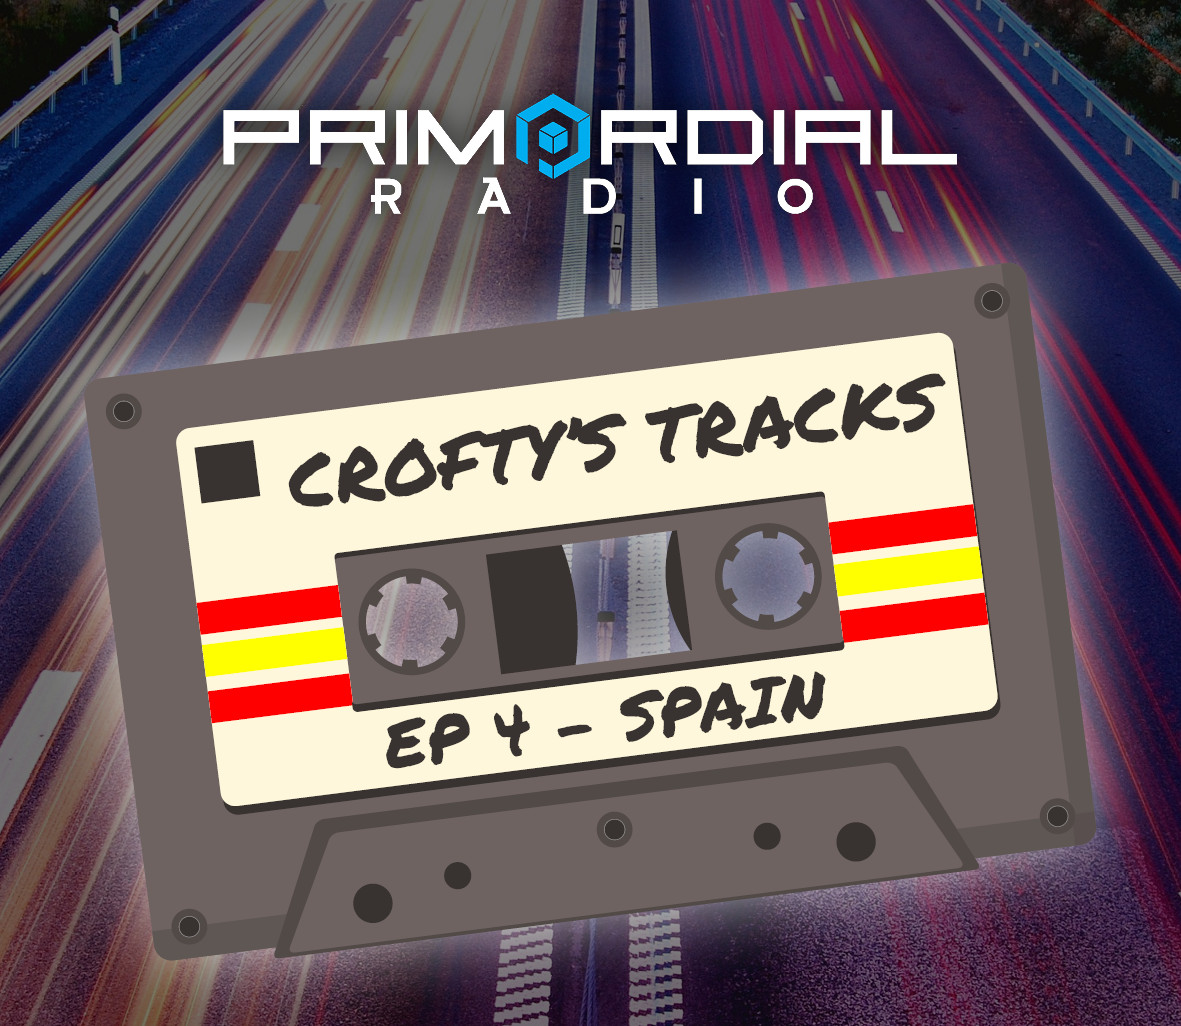 Croftys Tracks - Lap 4